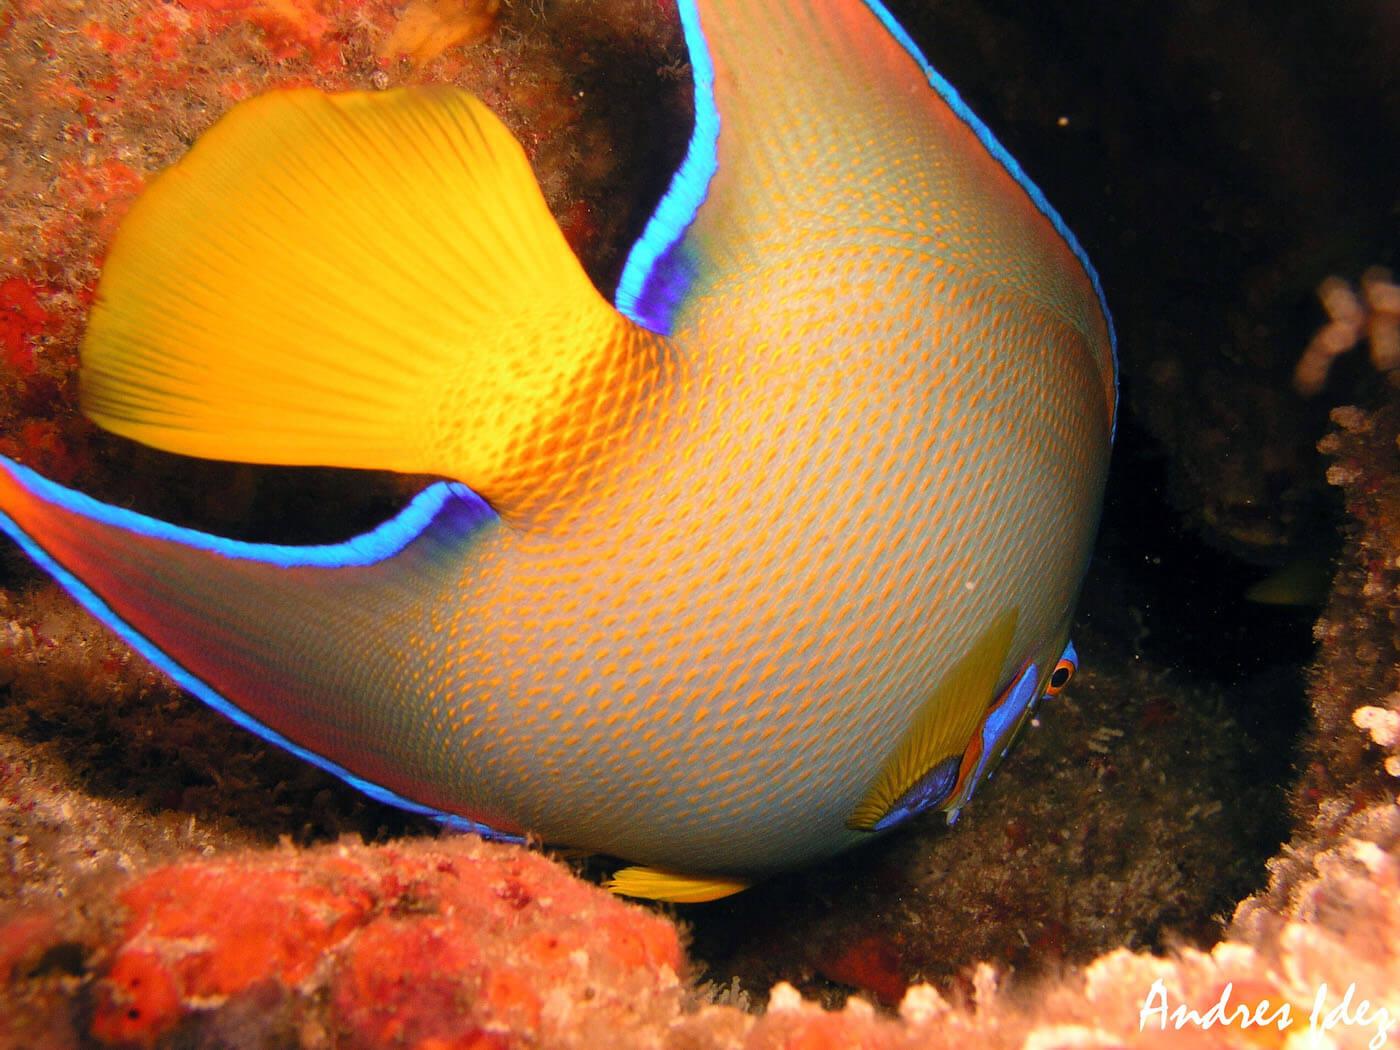 Isla Mujeres Scuba Diving Snorkeling Manchones Reef Squalo Adventures-10